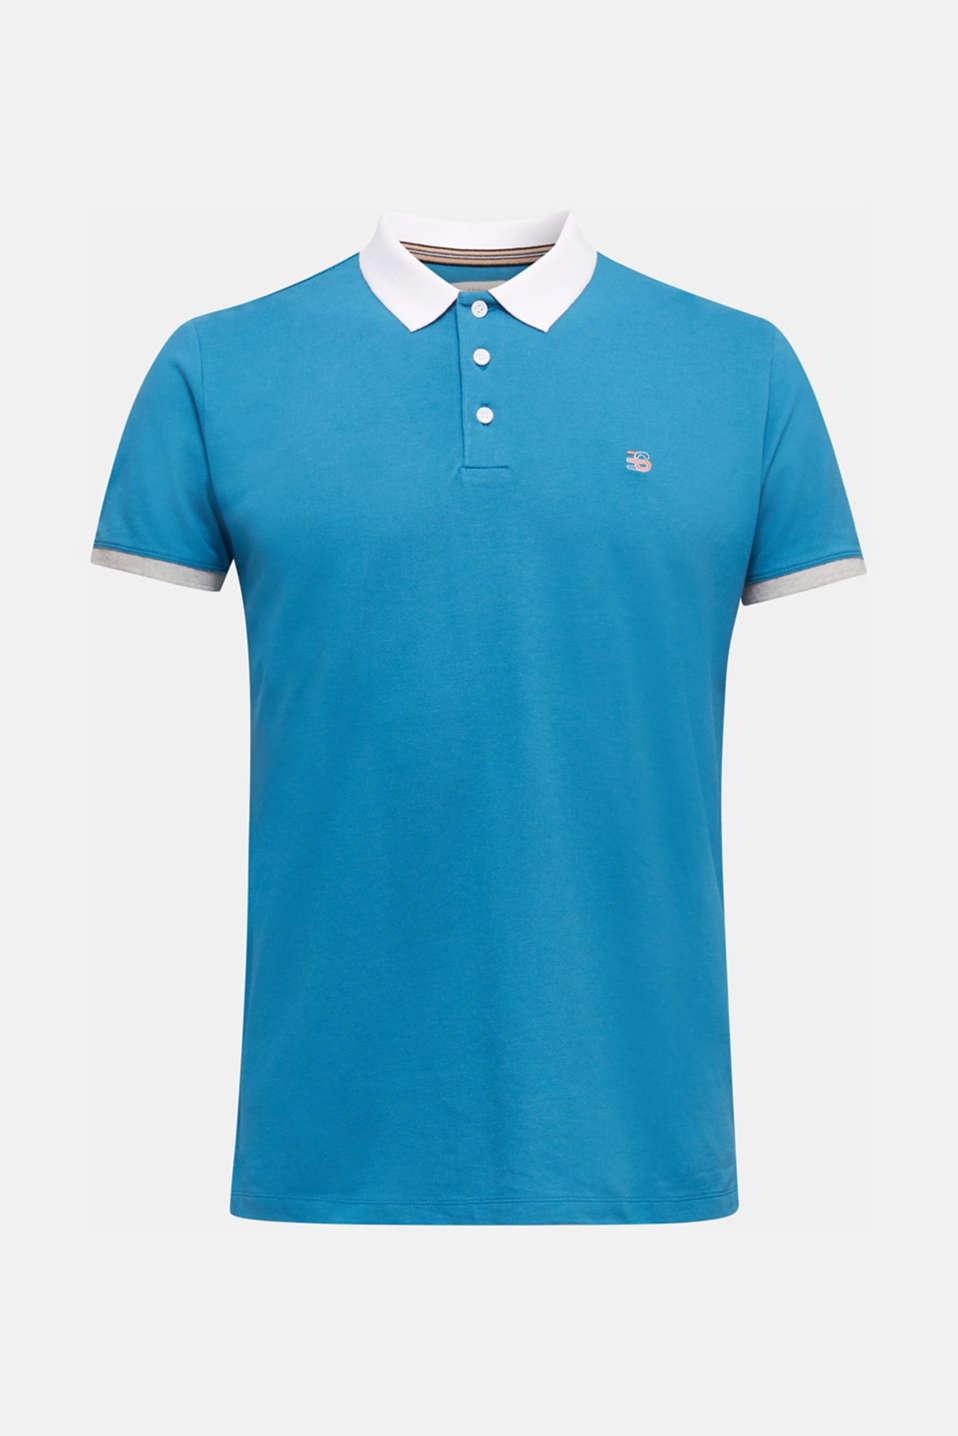 Stretch cotton piqué polo shirt, PETROL BLUE 2, detail image number 7